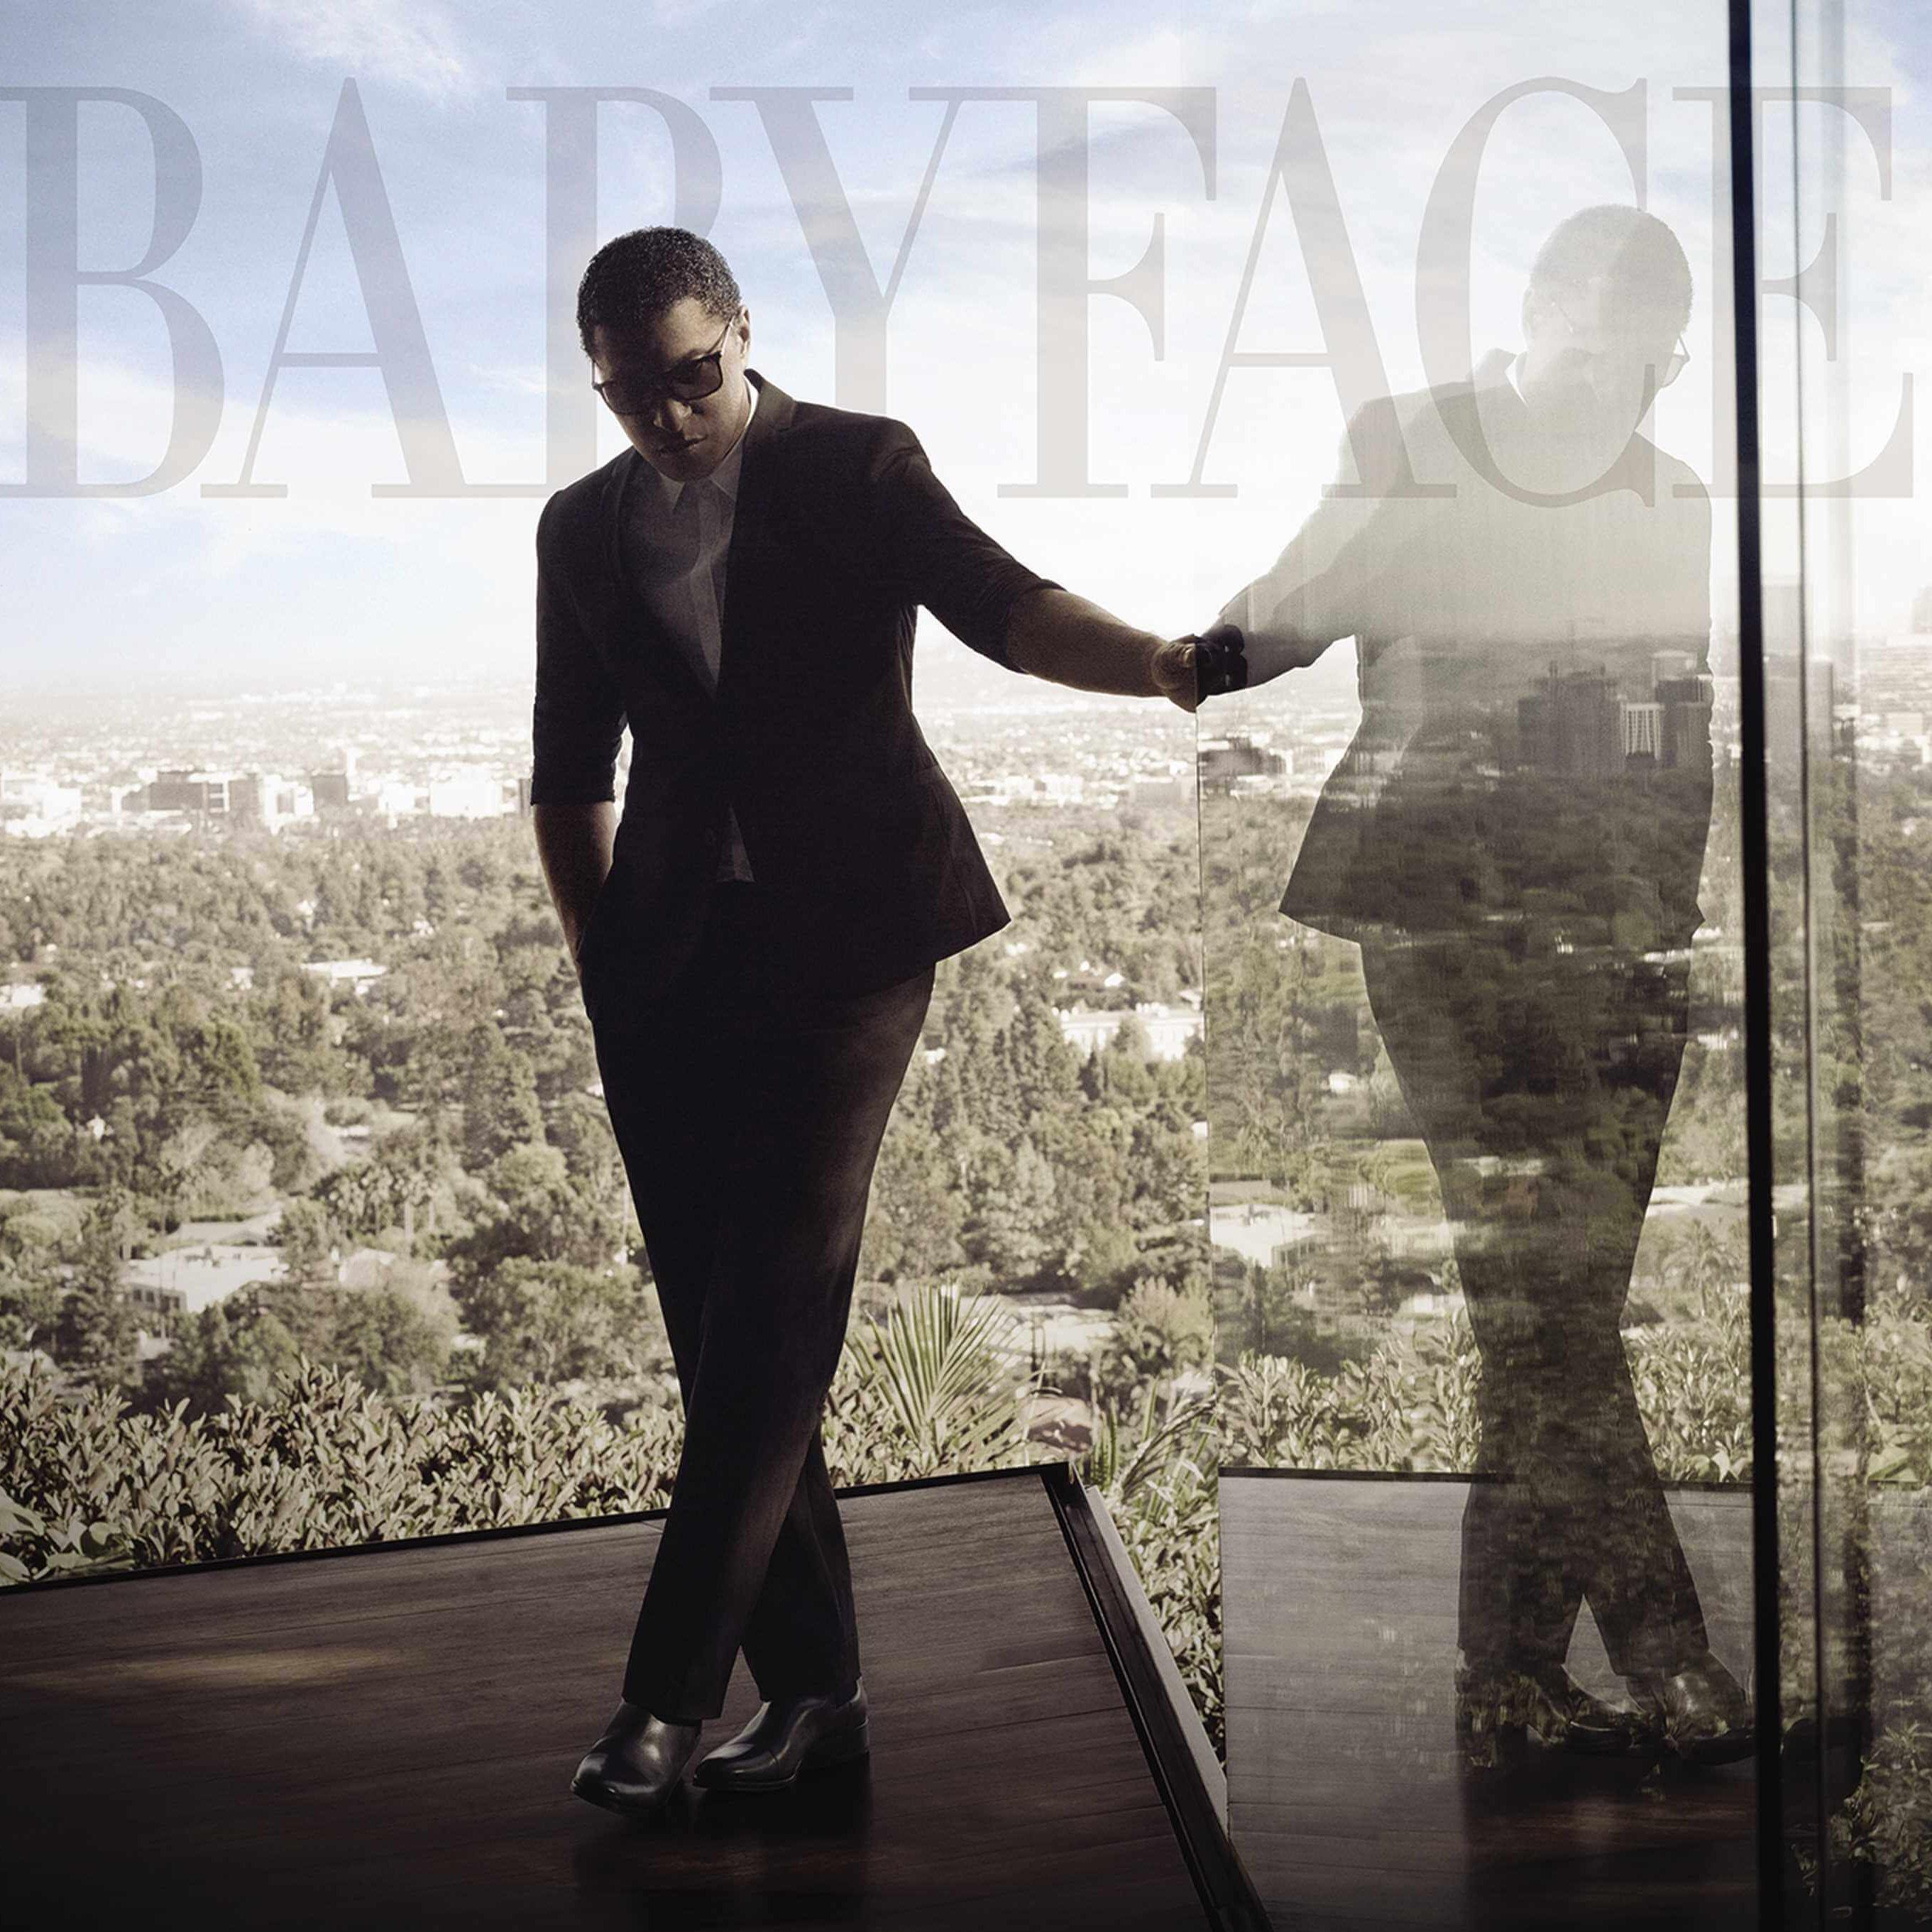 Kenny 'Babyface' Edmonds Live in Las Vegas